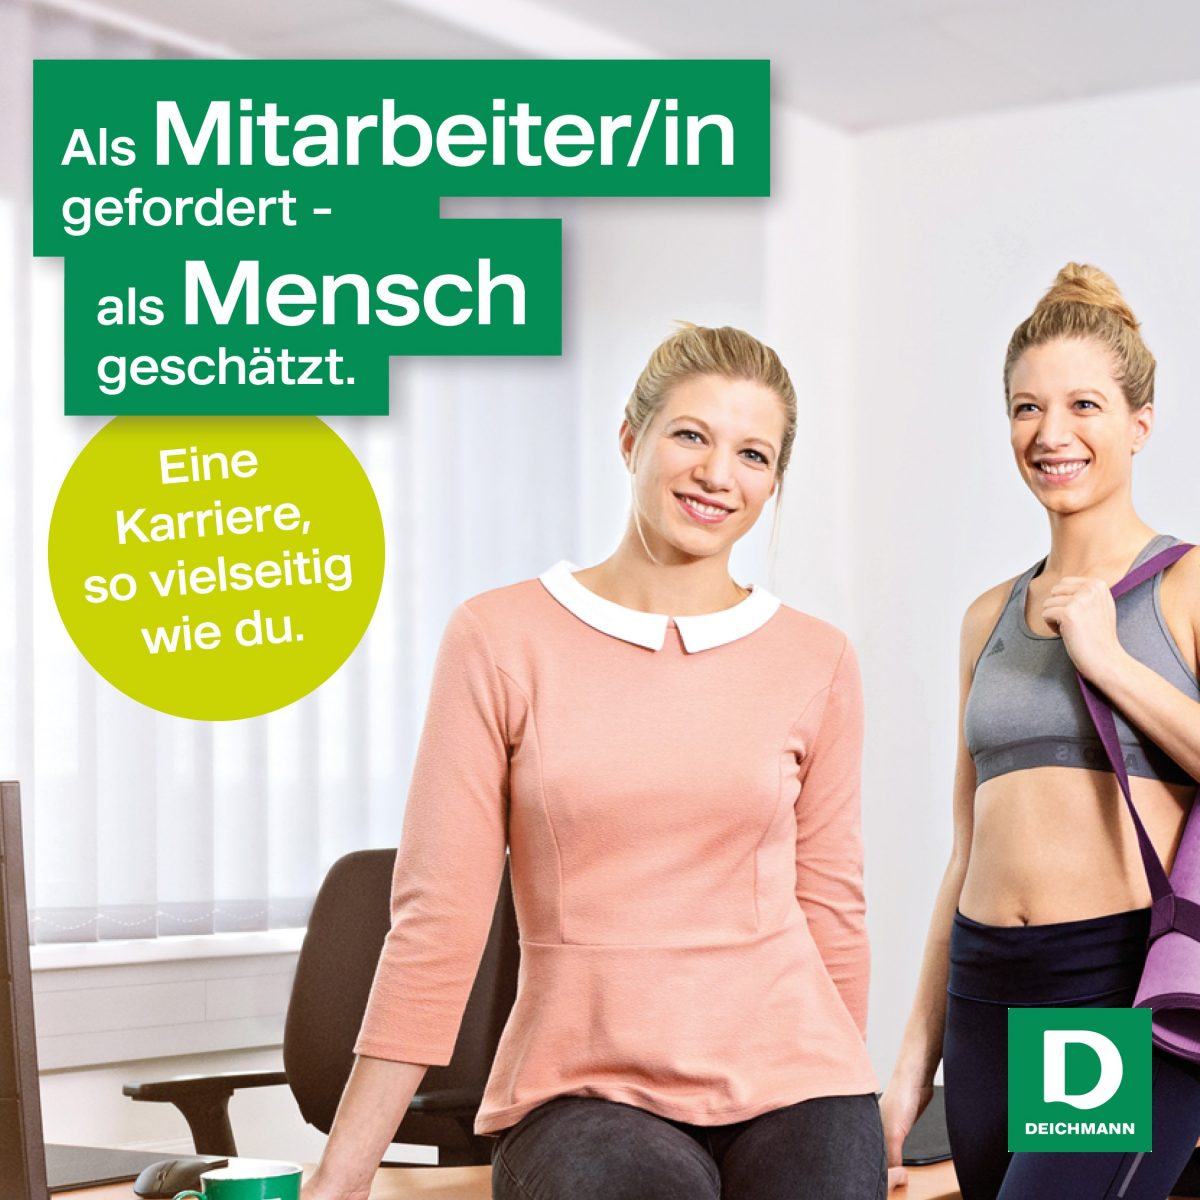 deichmann-sujet-employer-branding-kampagne-identifire